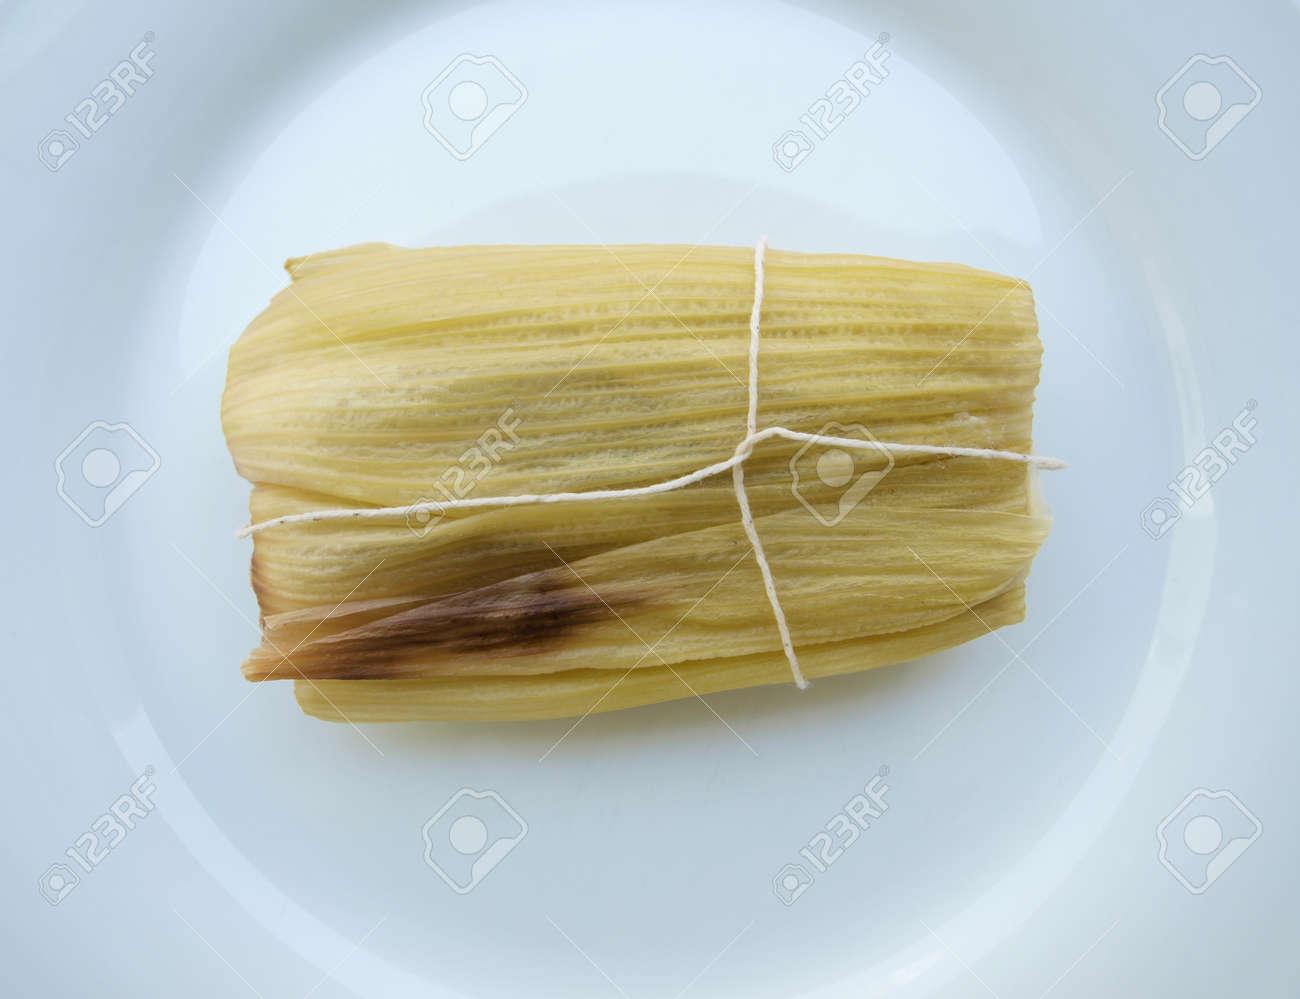 Sweet tamale, a traditional Latin American corn wrap Stock Photo - 11411504